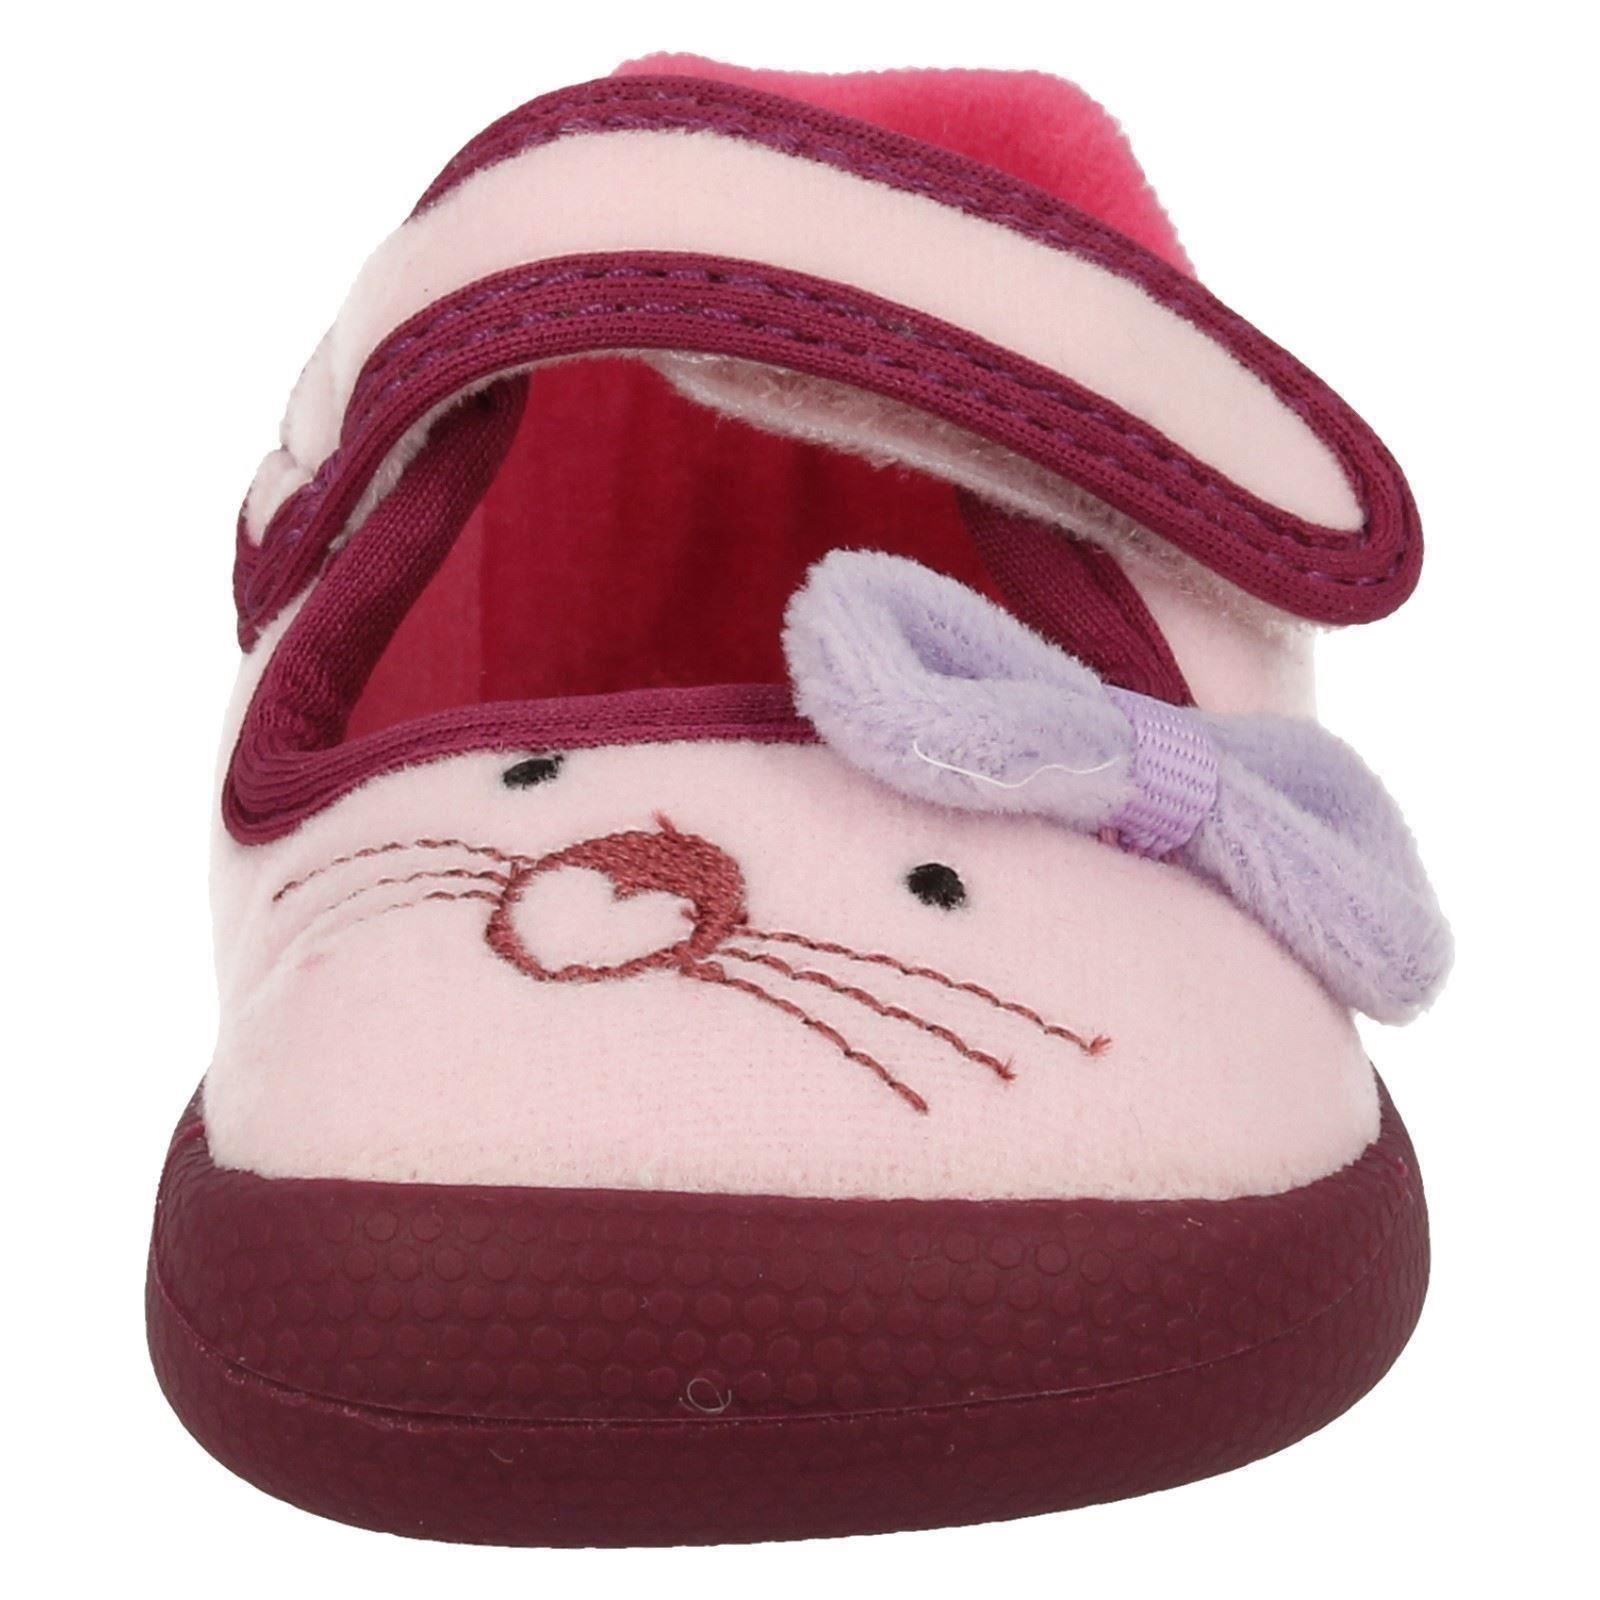 Infant Girls Clarks Machine Washable Slippers Shilo Candy